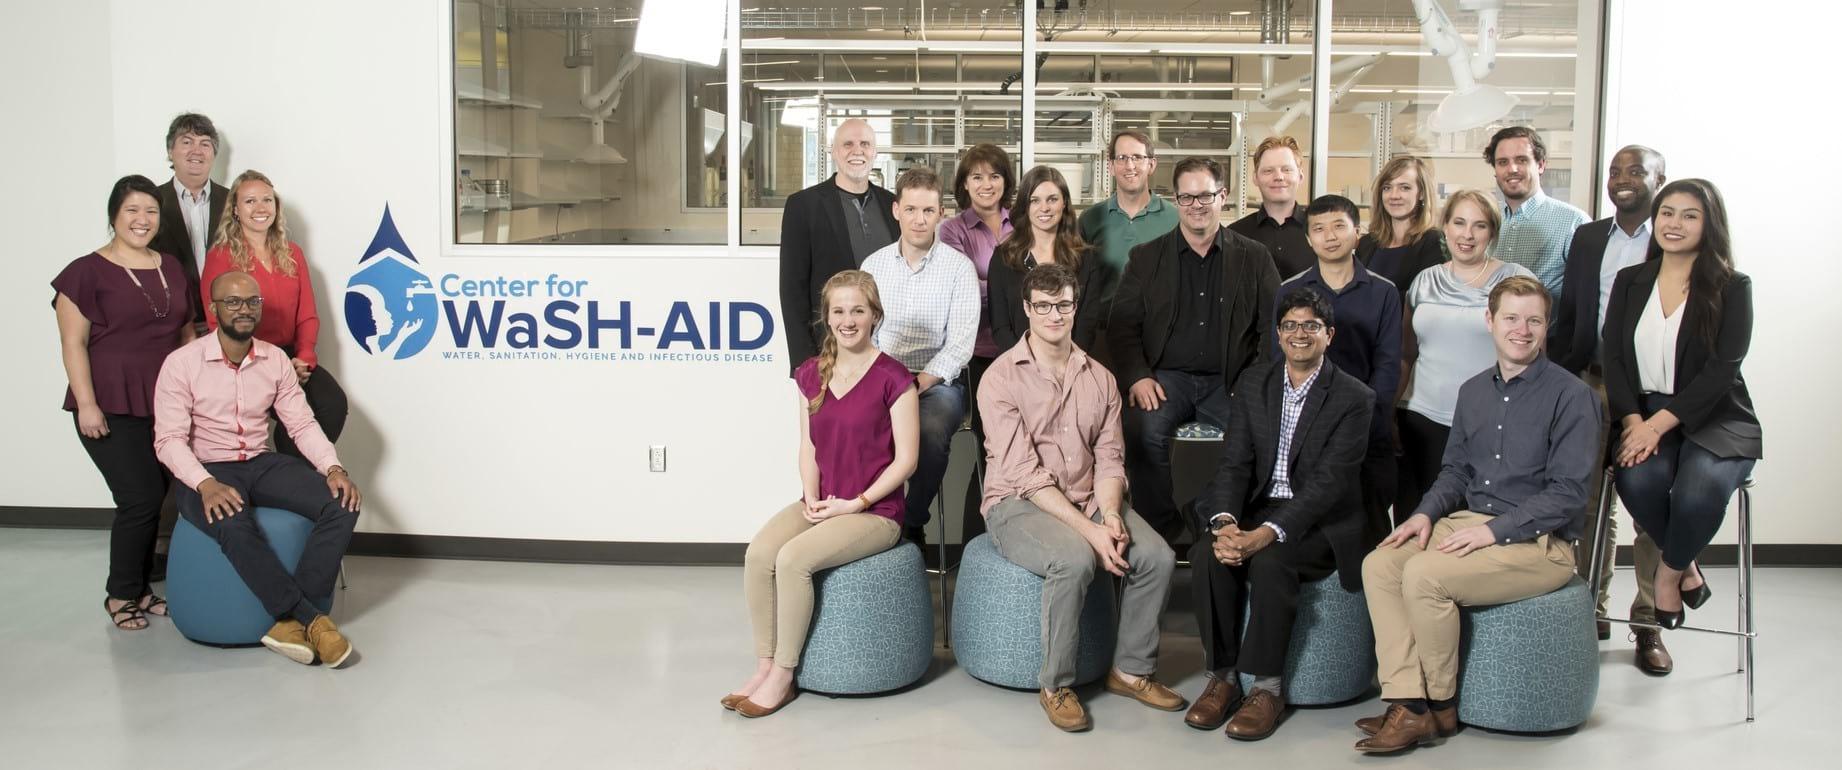 The WaSH-AID Team